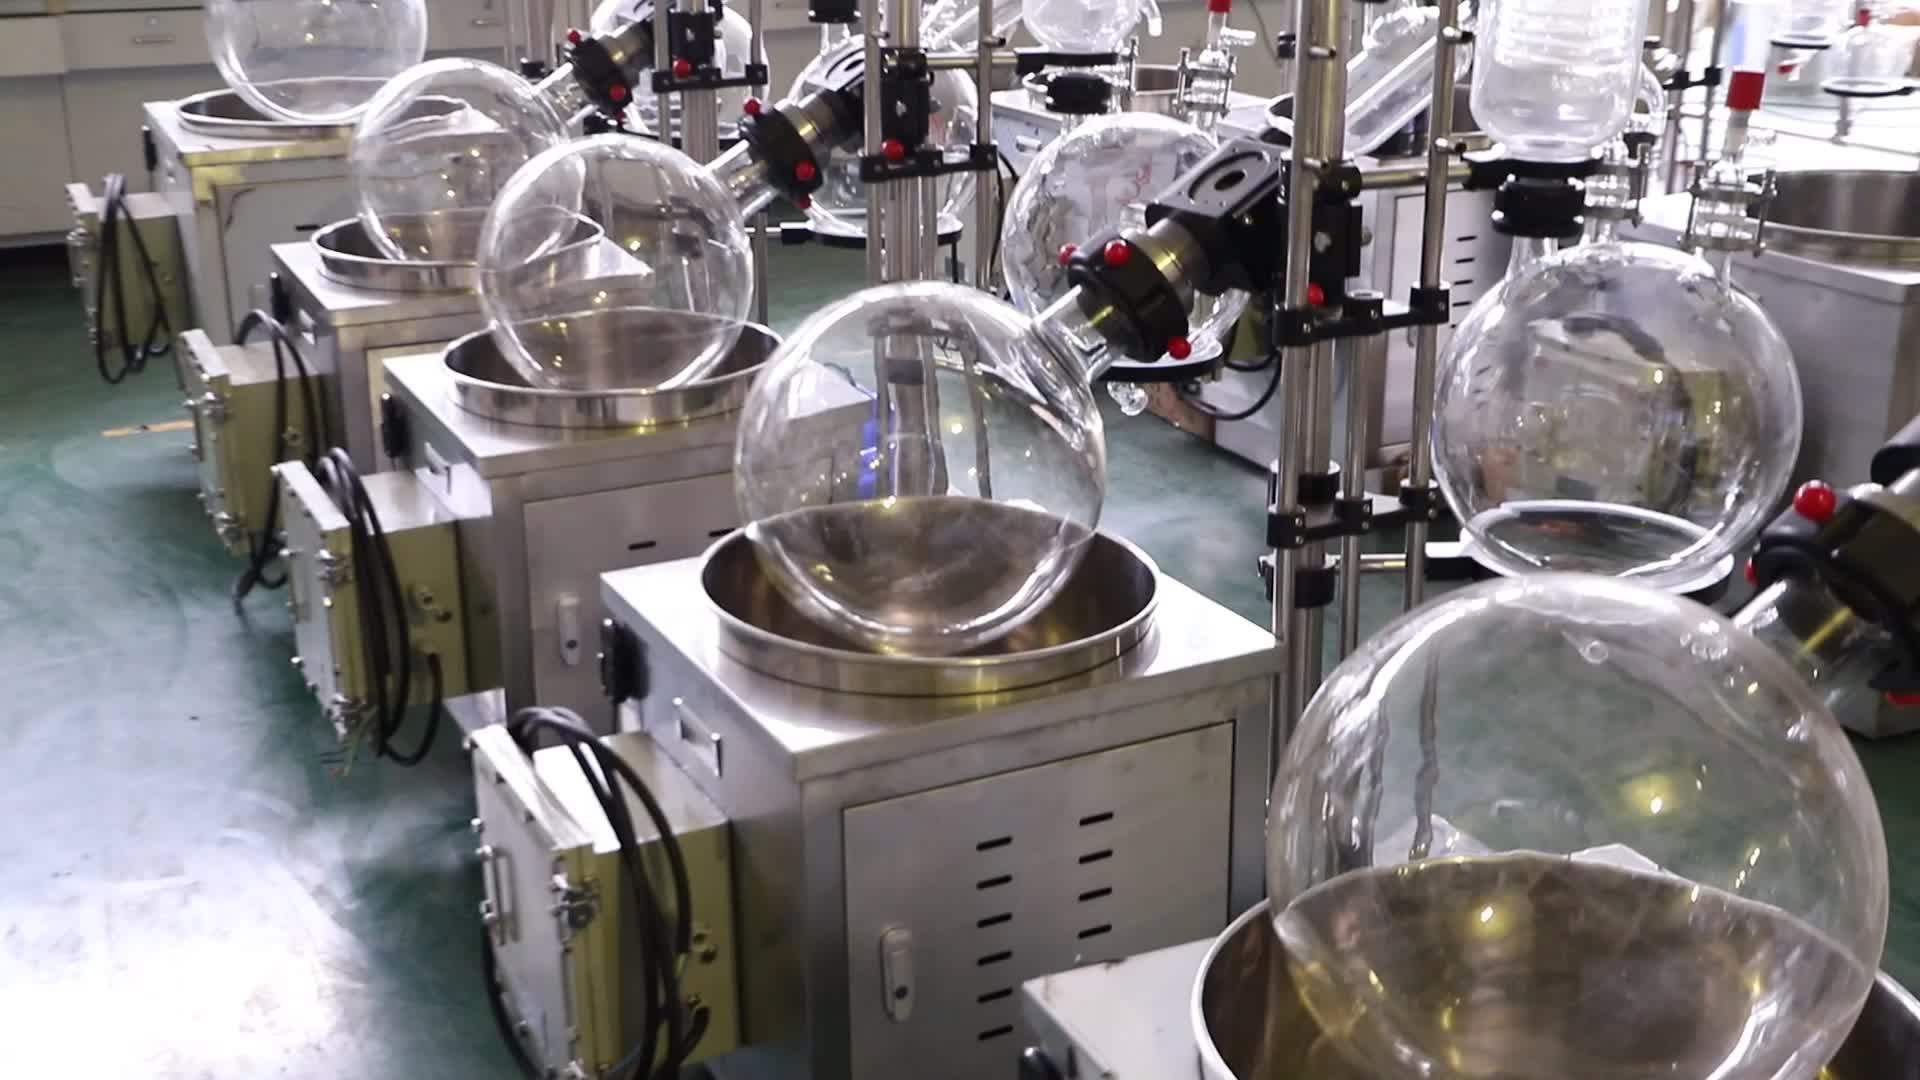 चीन 2l आसवन प्रयोगशाला के लिए वैक्यूम रोटरी बाष्पीकरण